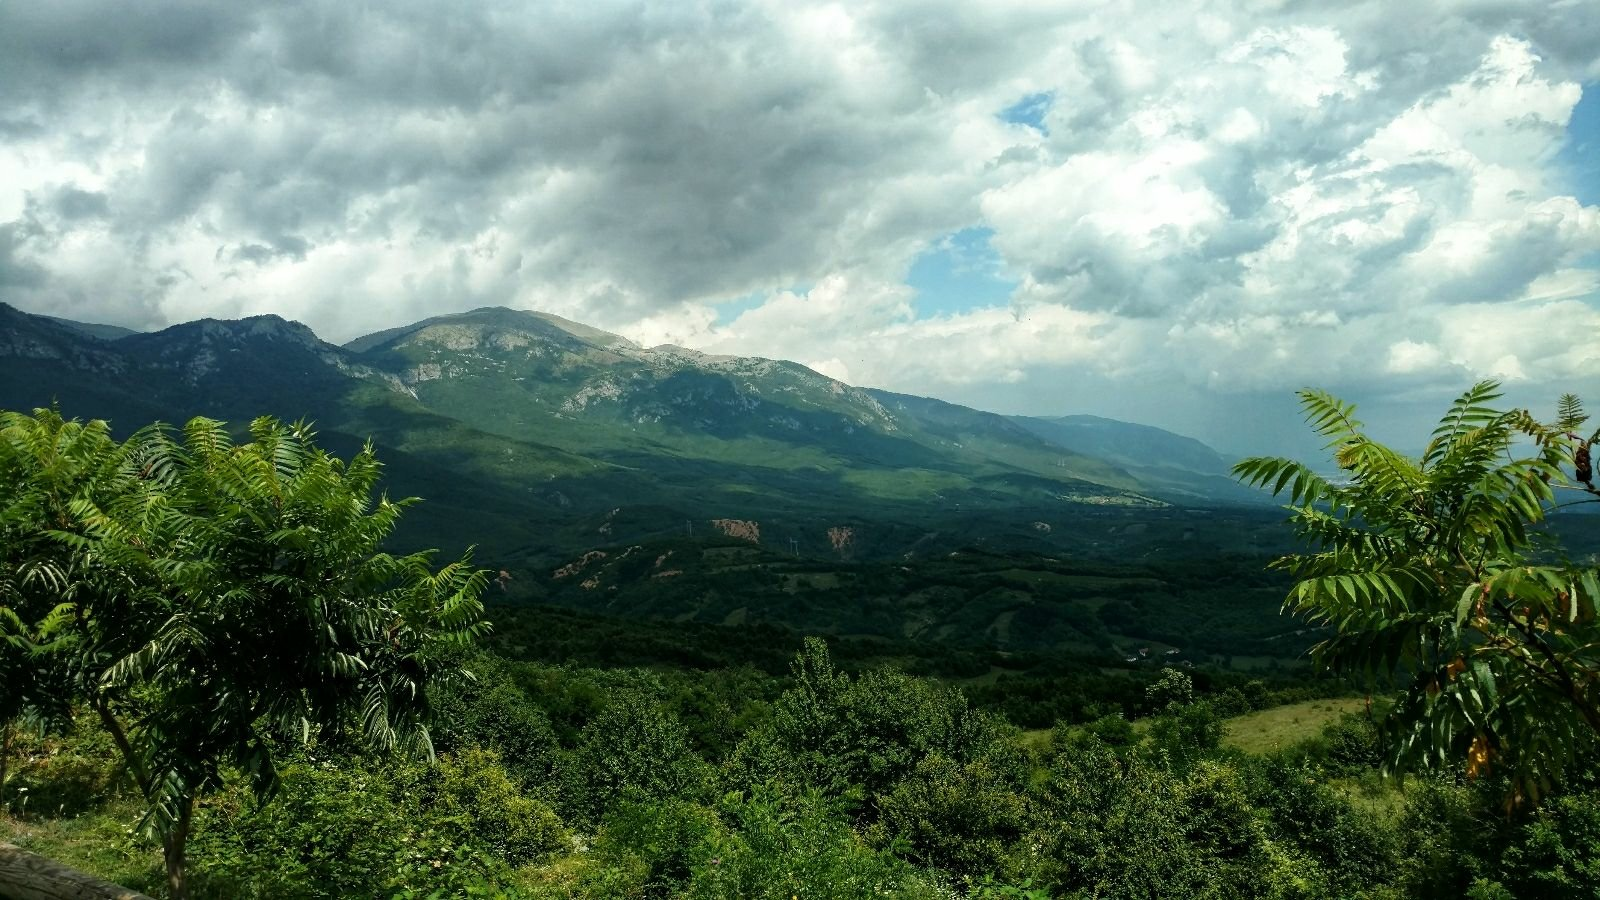 BEtween Borders | Biking from Skopje to Mostar